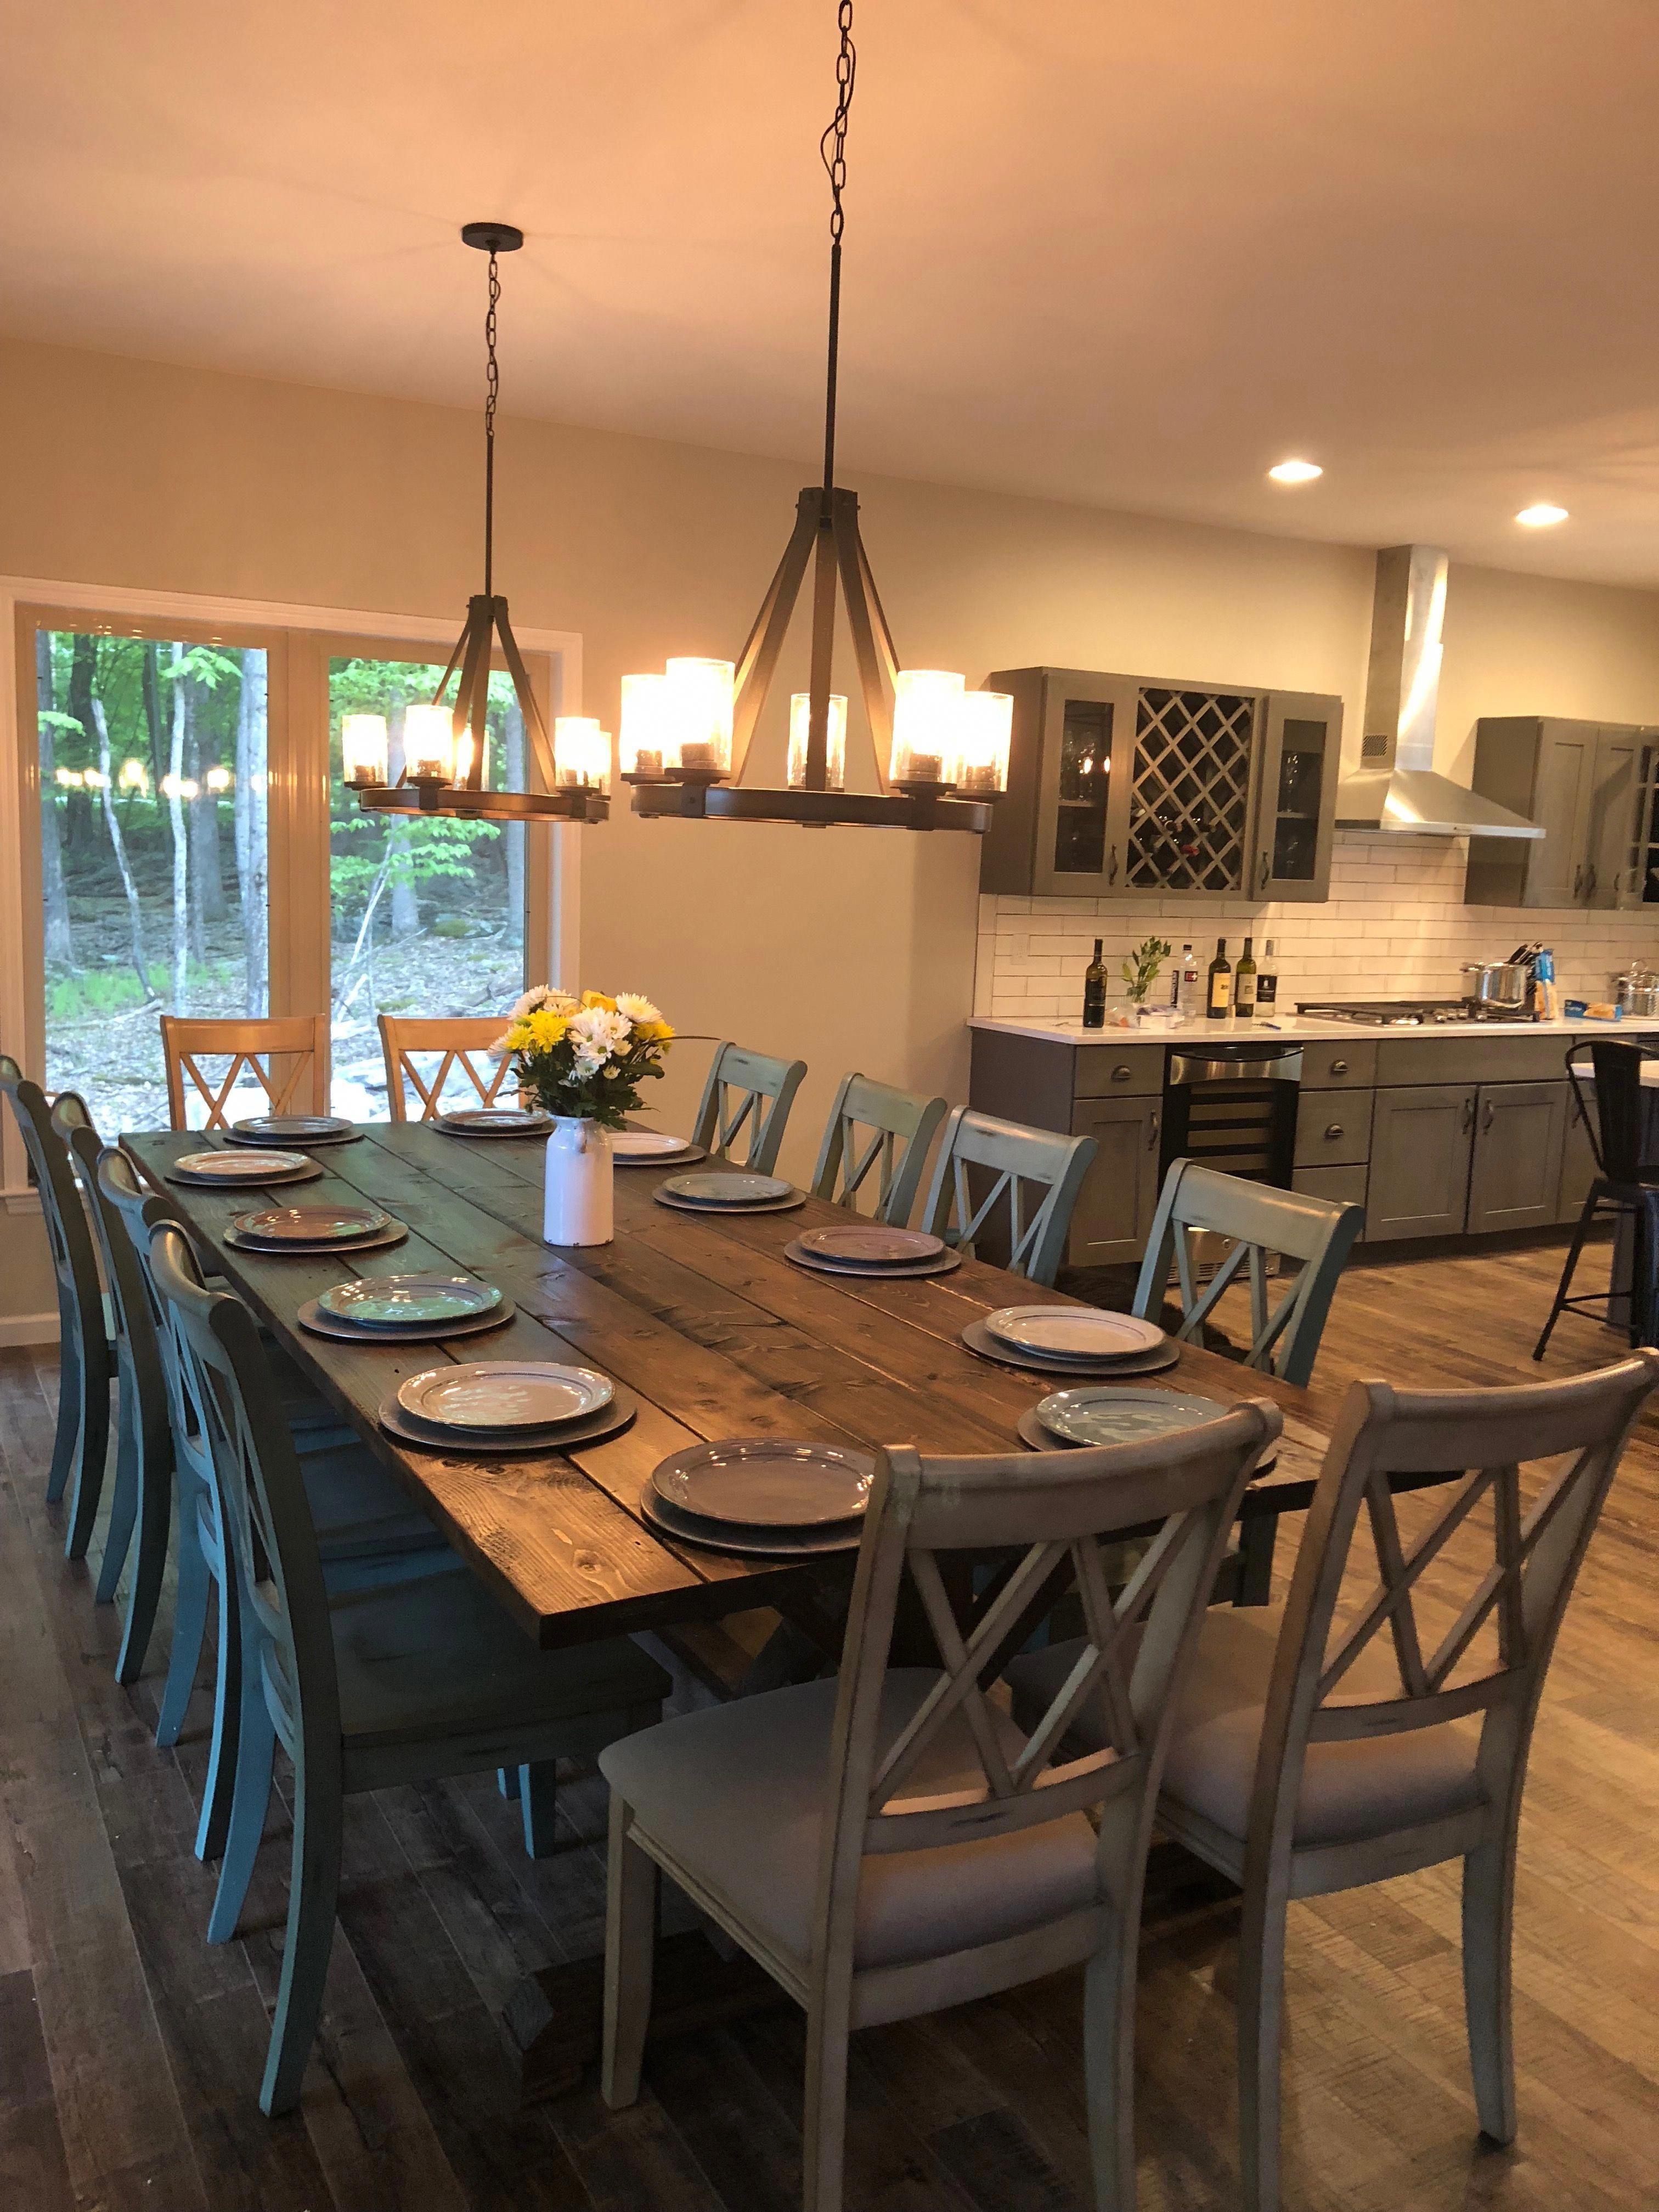 20 Modernos De Lujo Comedores De Buenas Ideas Para Su Hogar Diseno Moderndiningroom Dining Table Rustic Farmhouse Dining Room Table Farmhouse Kitchen Tables